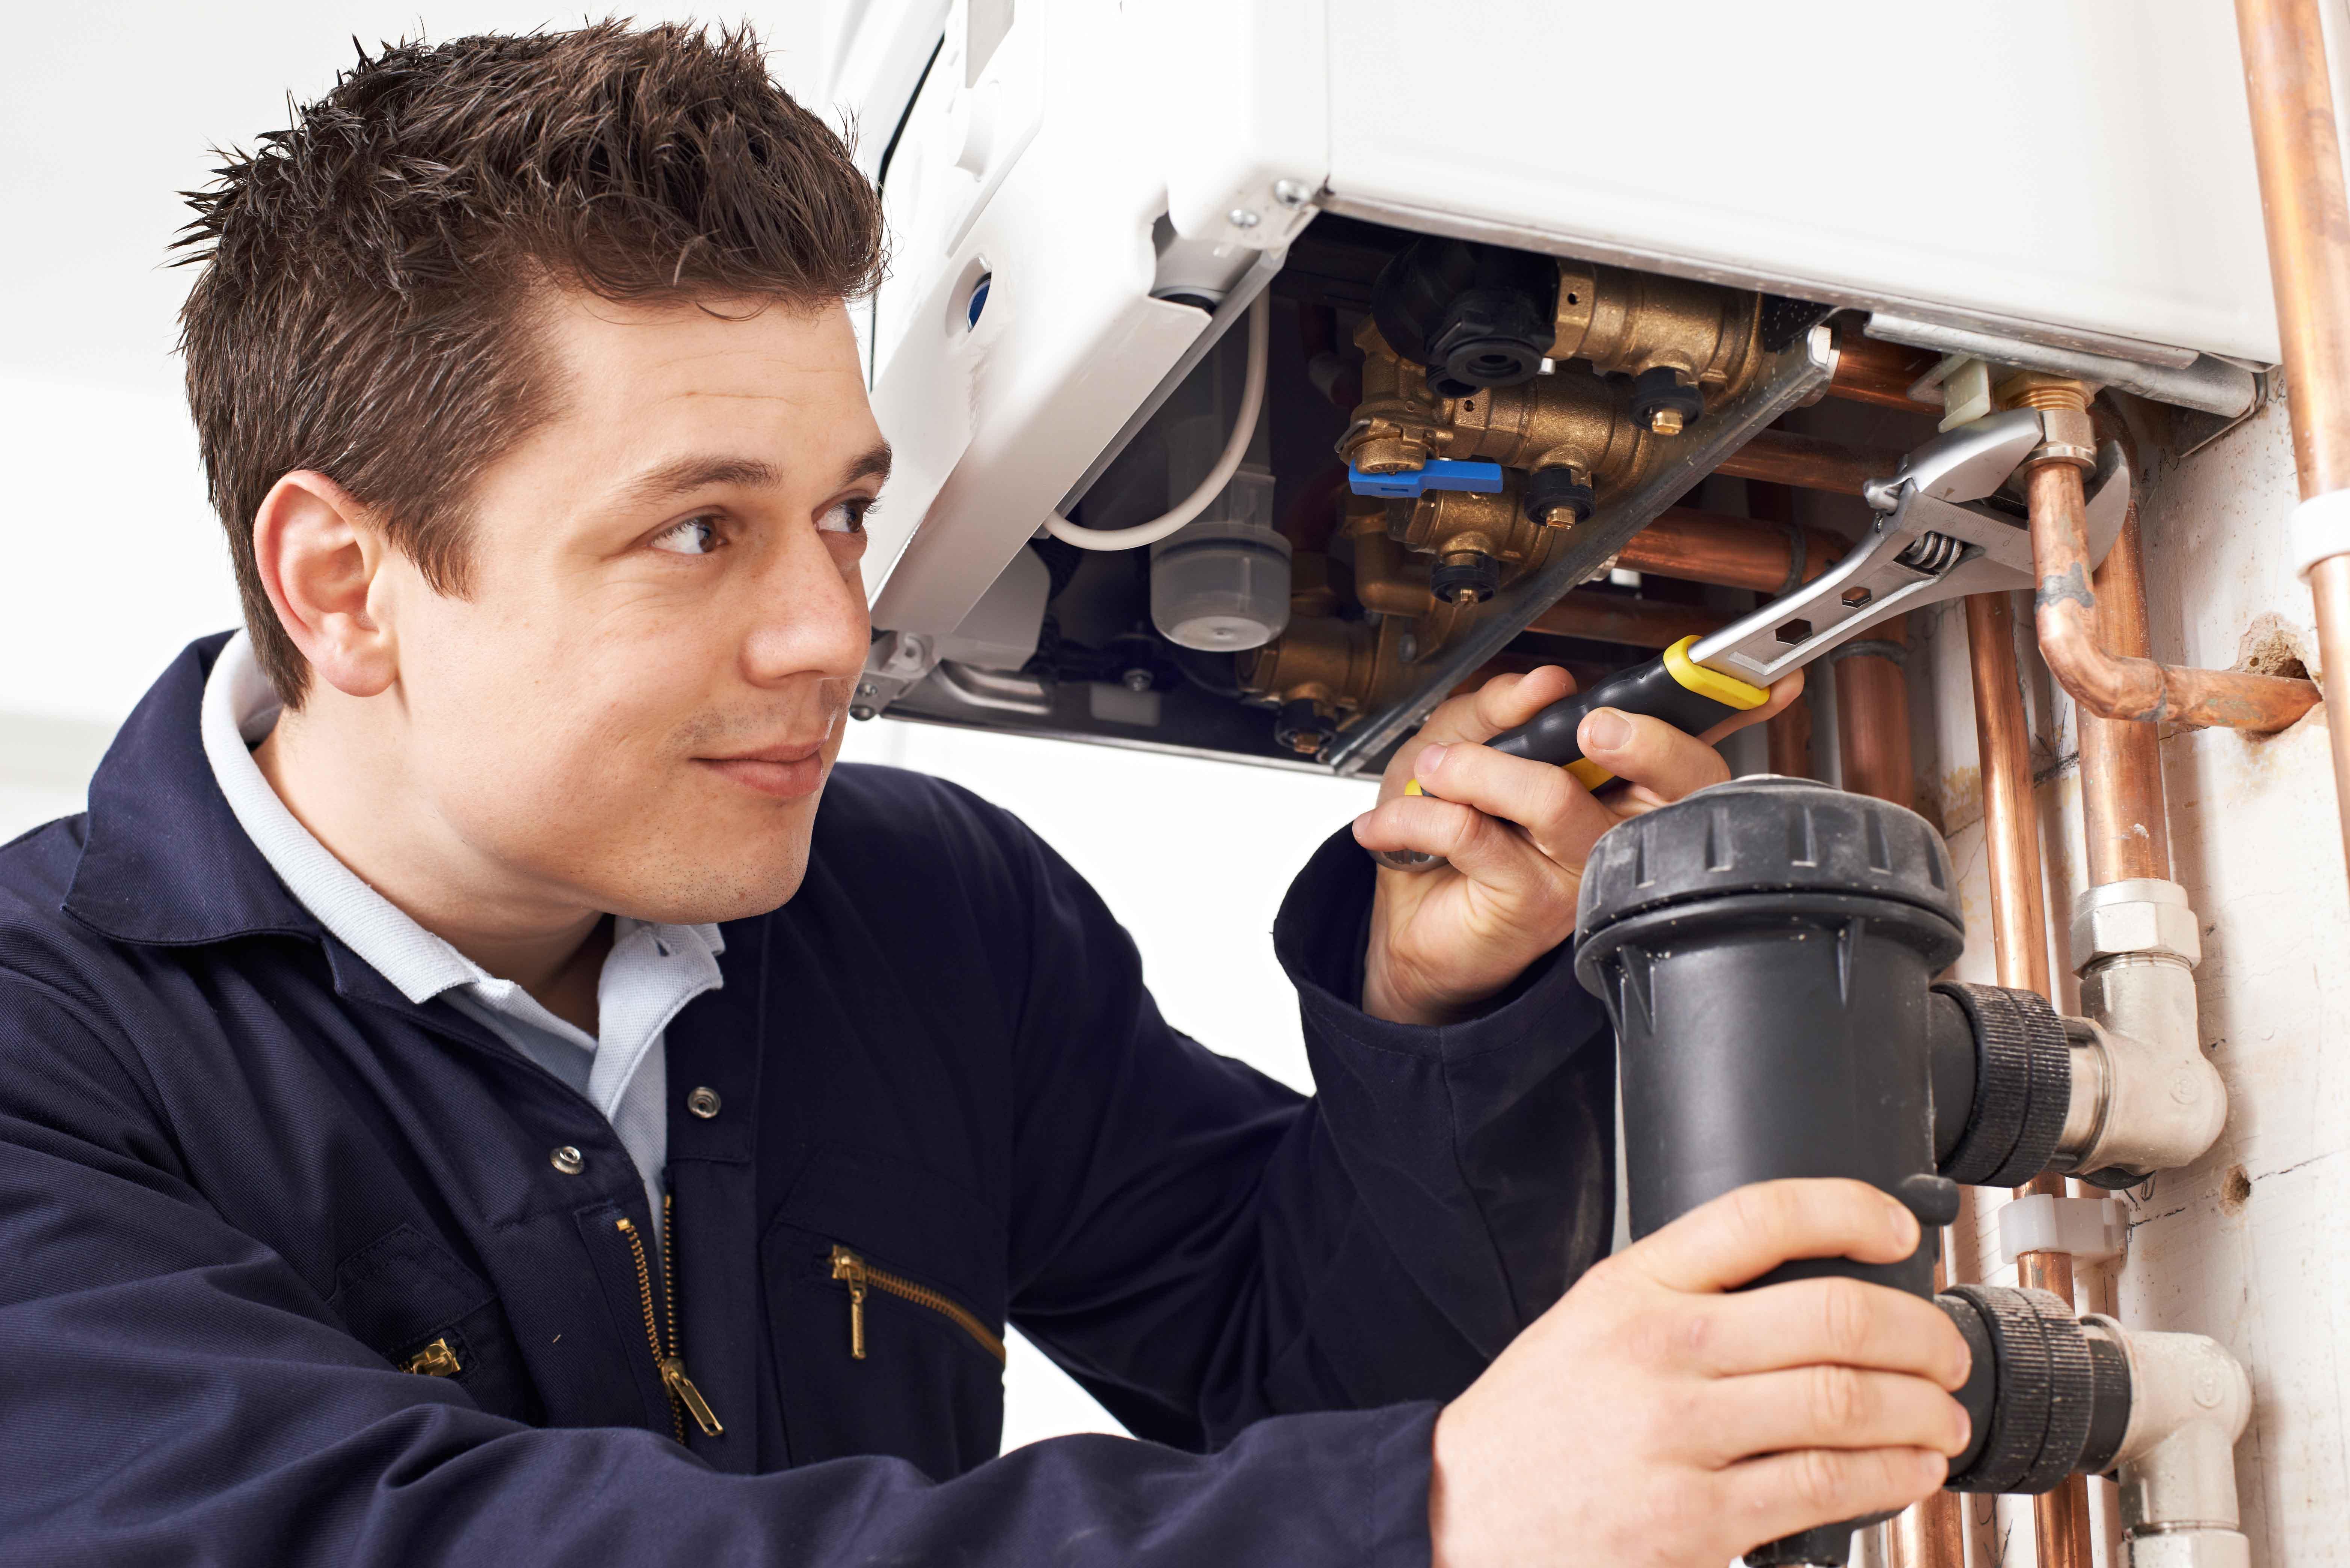 Técnico reparando calefacción